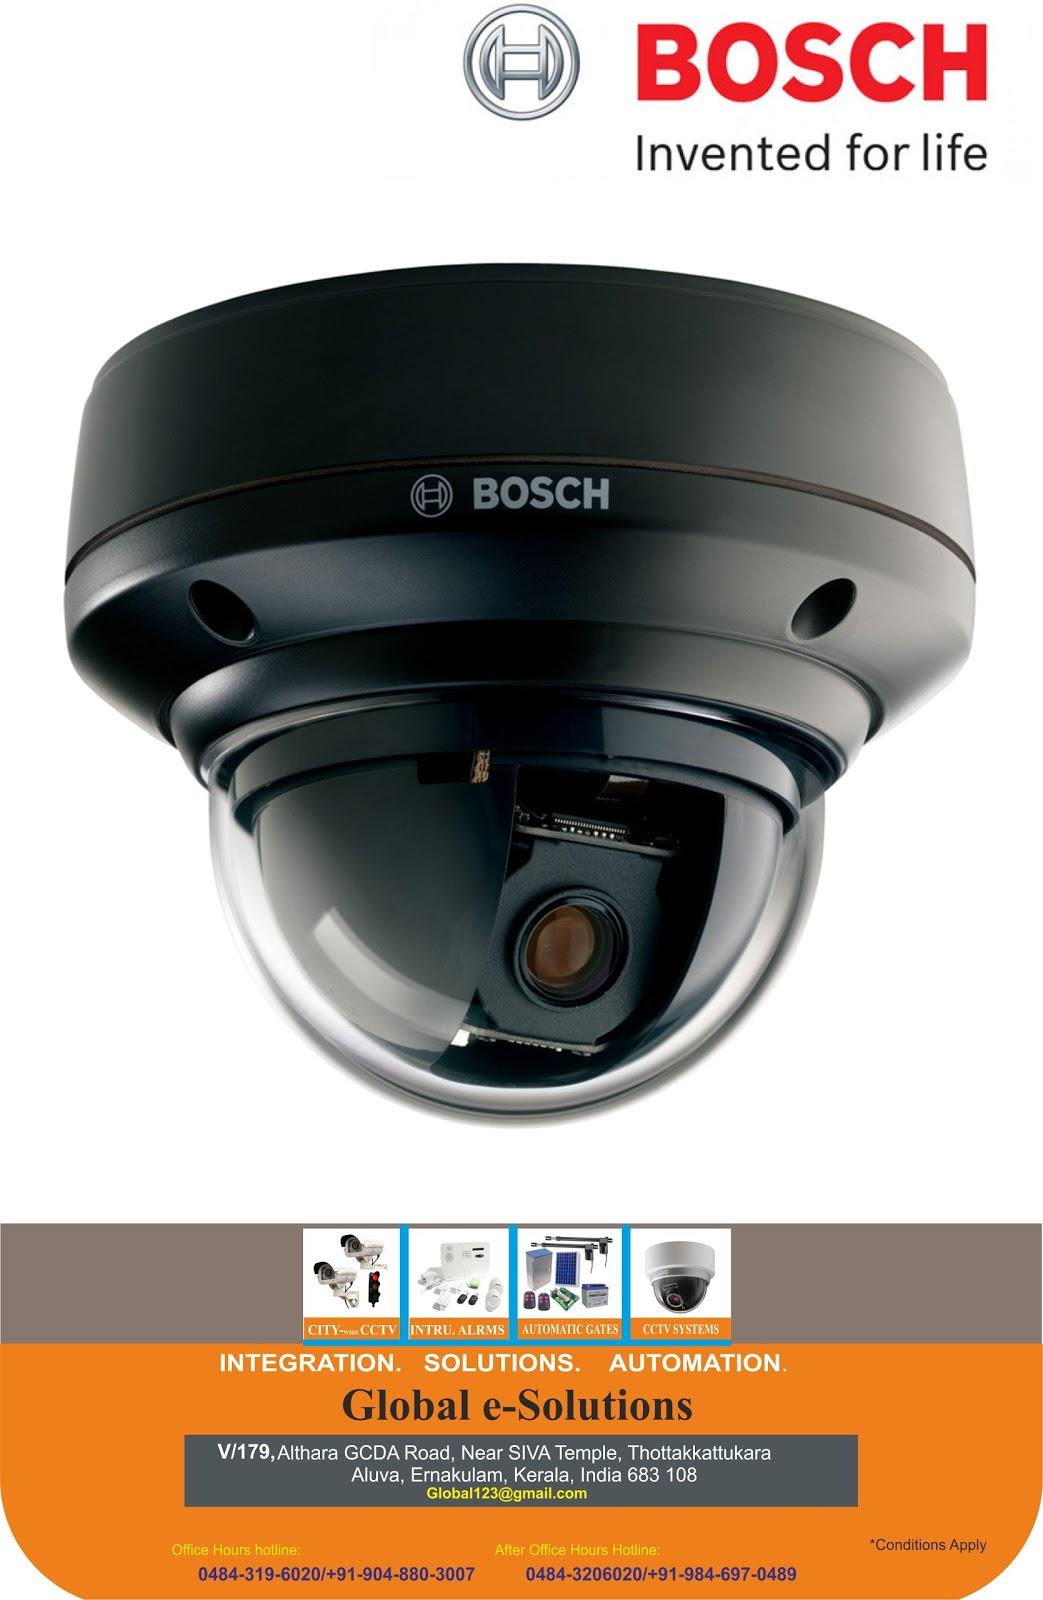 Cctv Dealer In Kerala Cctv Camera Whole Sales Dealer In